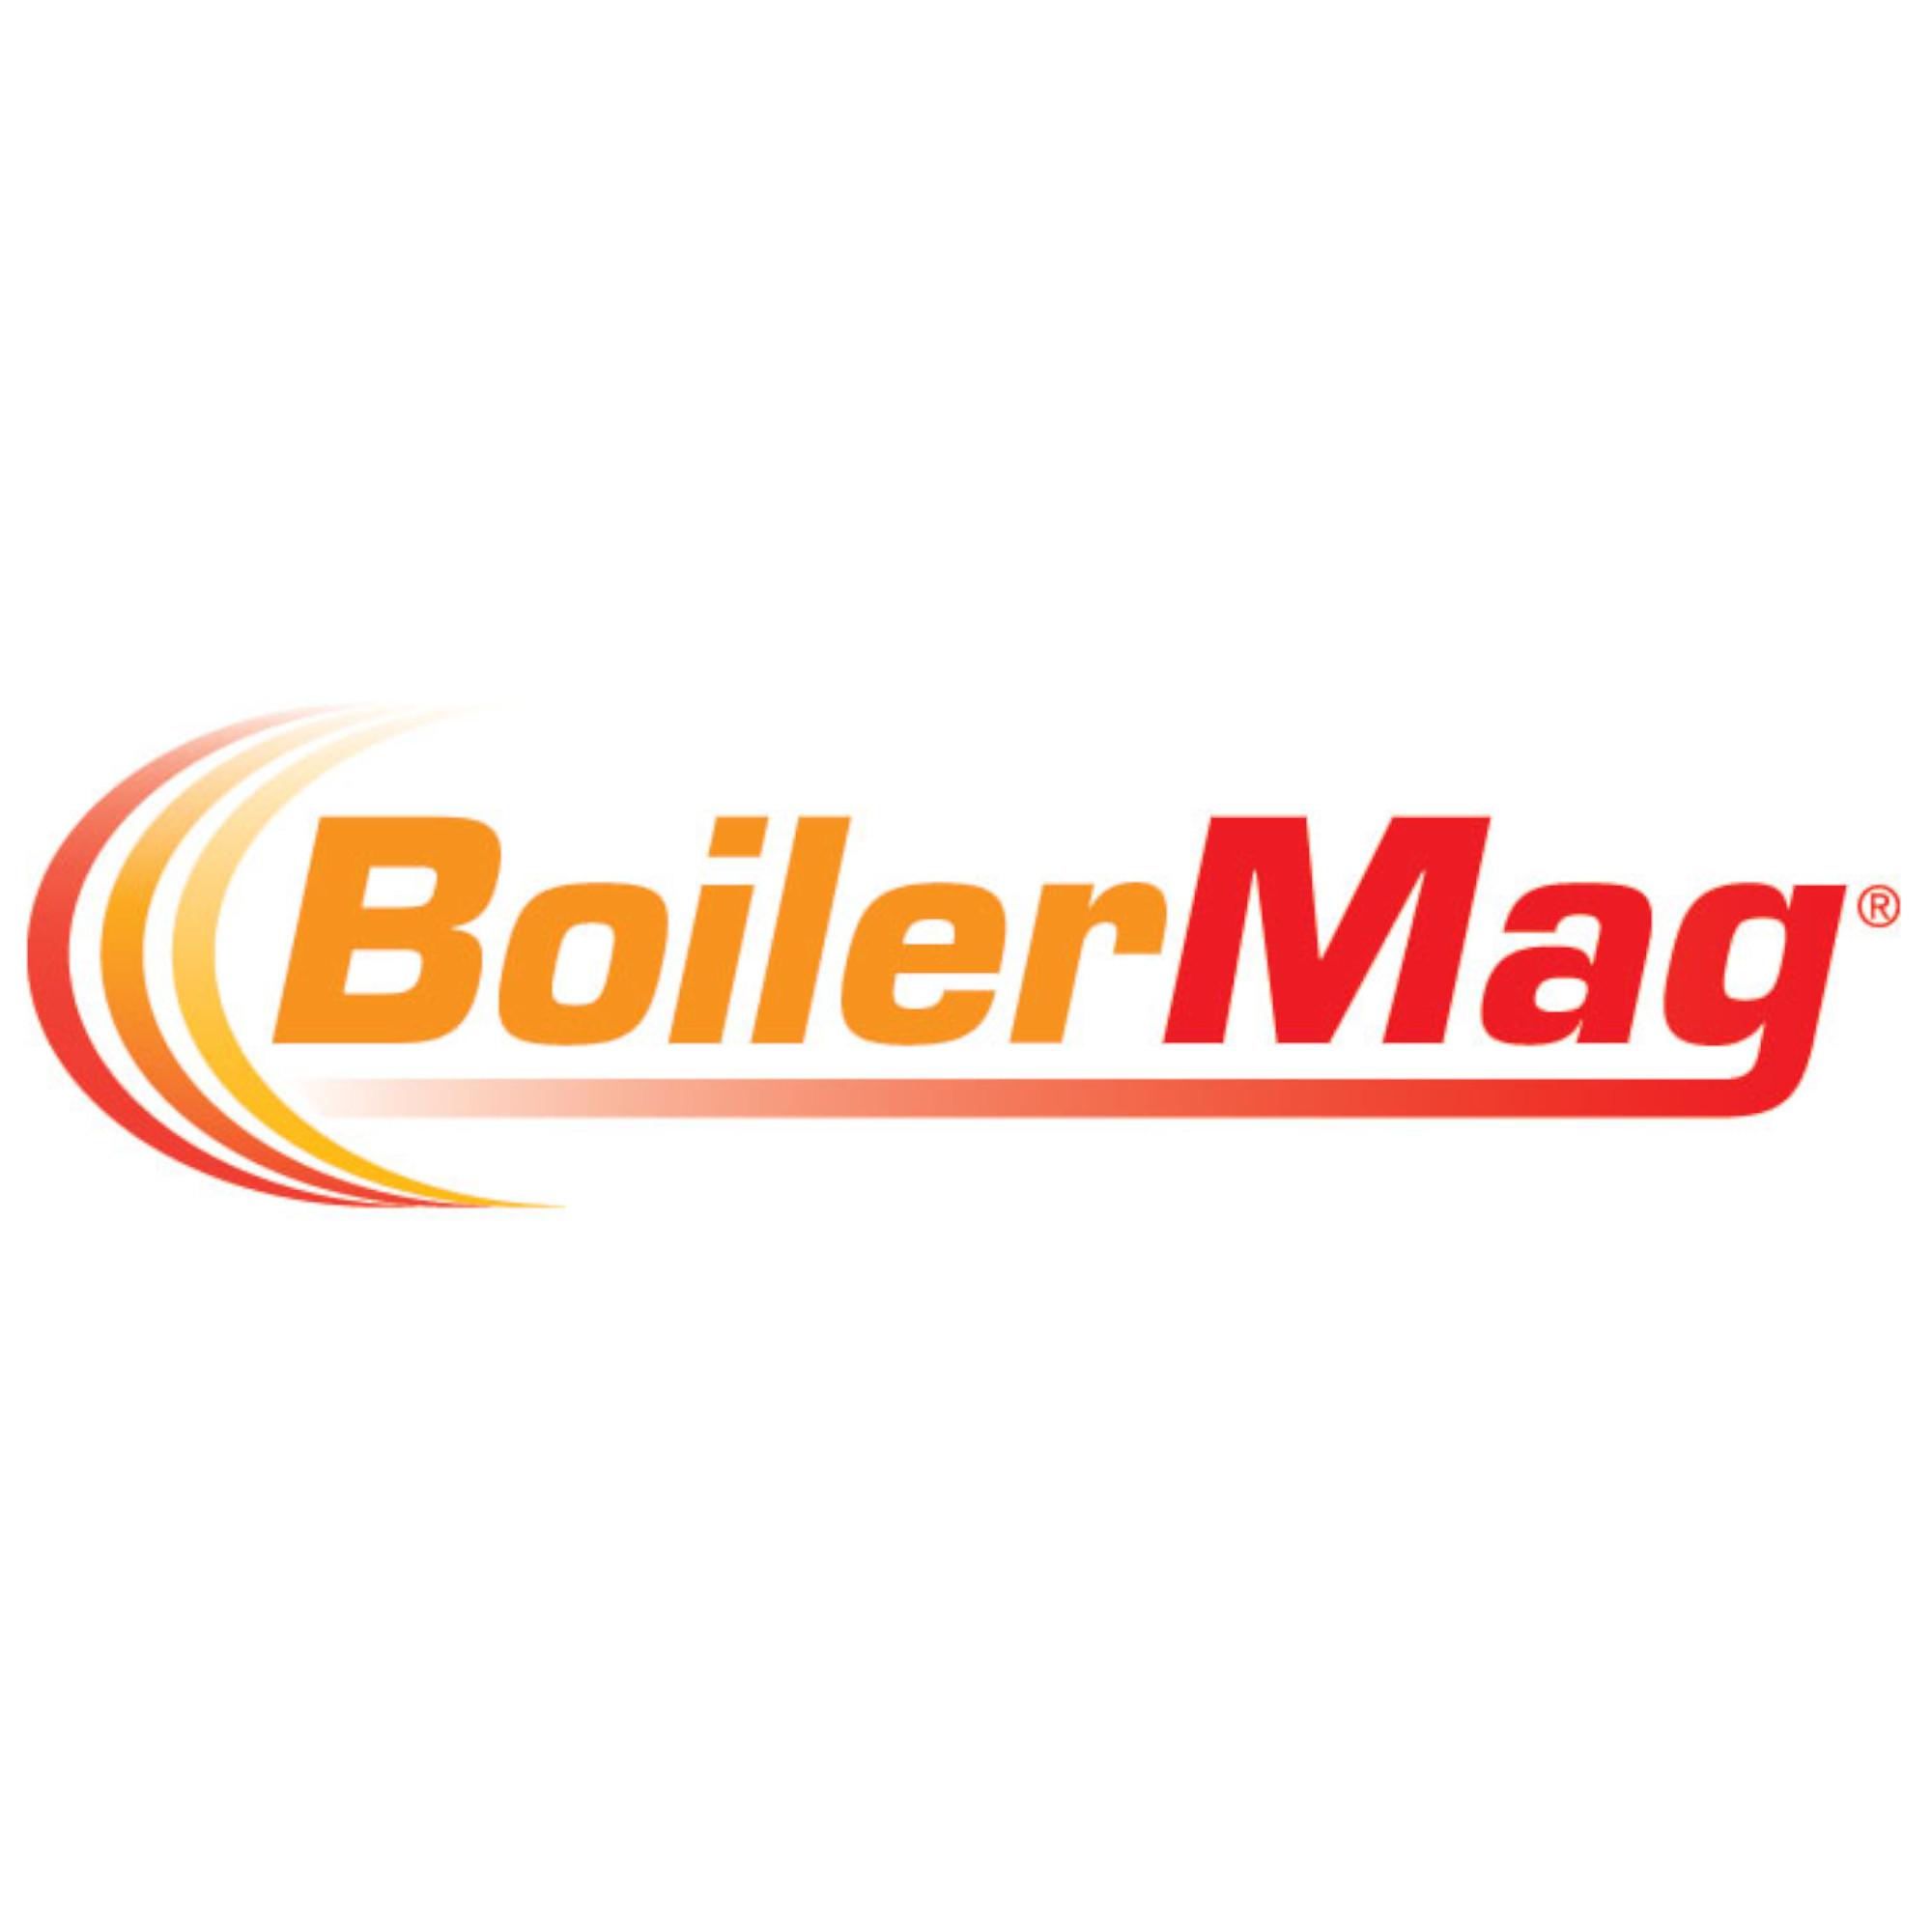 BoilerMag Brand Image